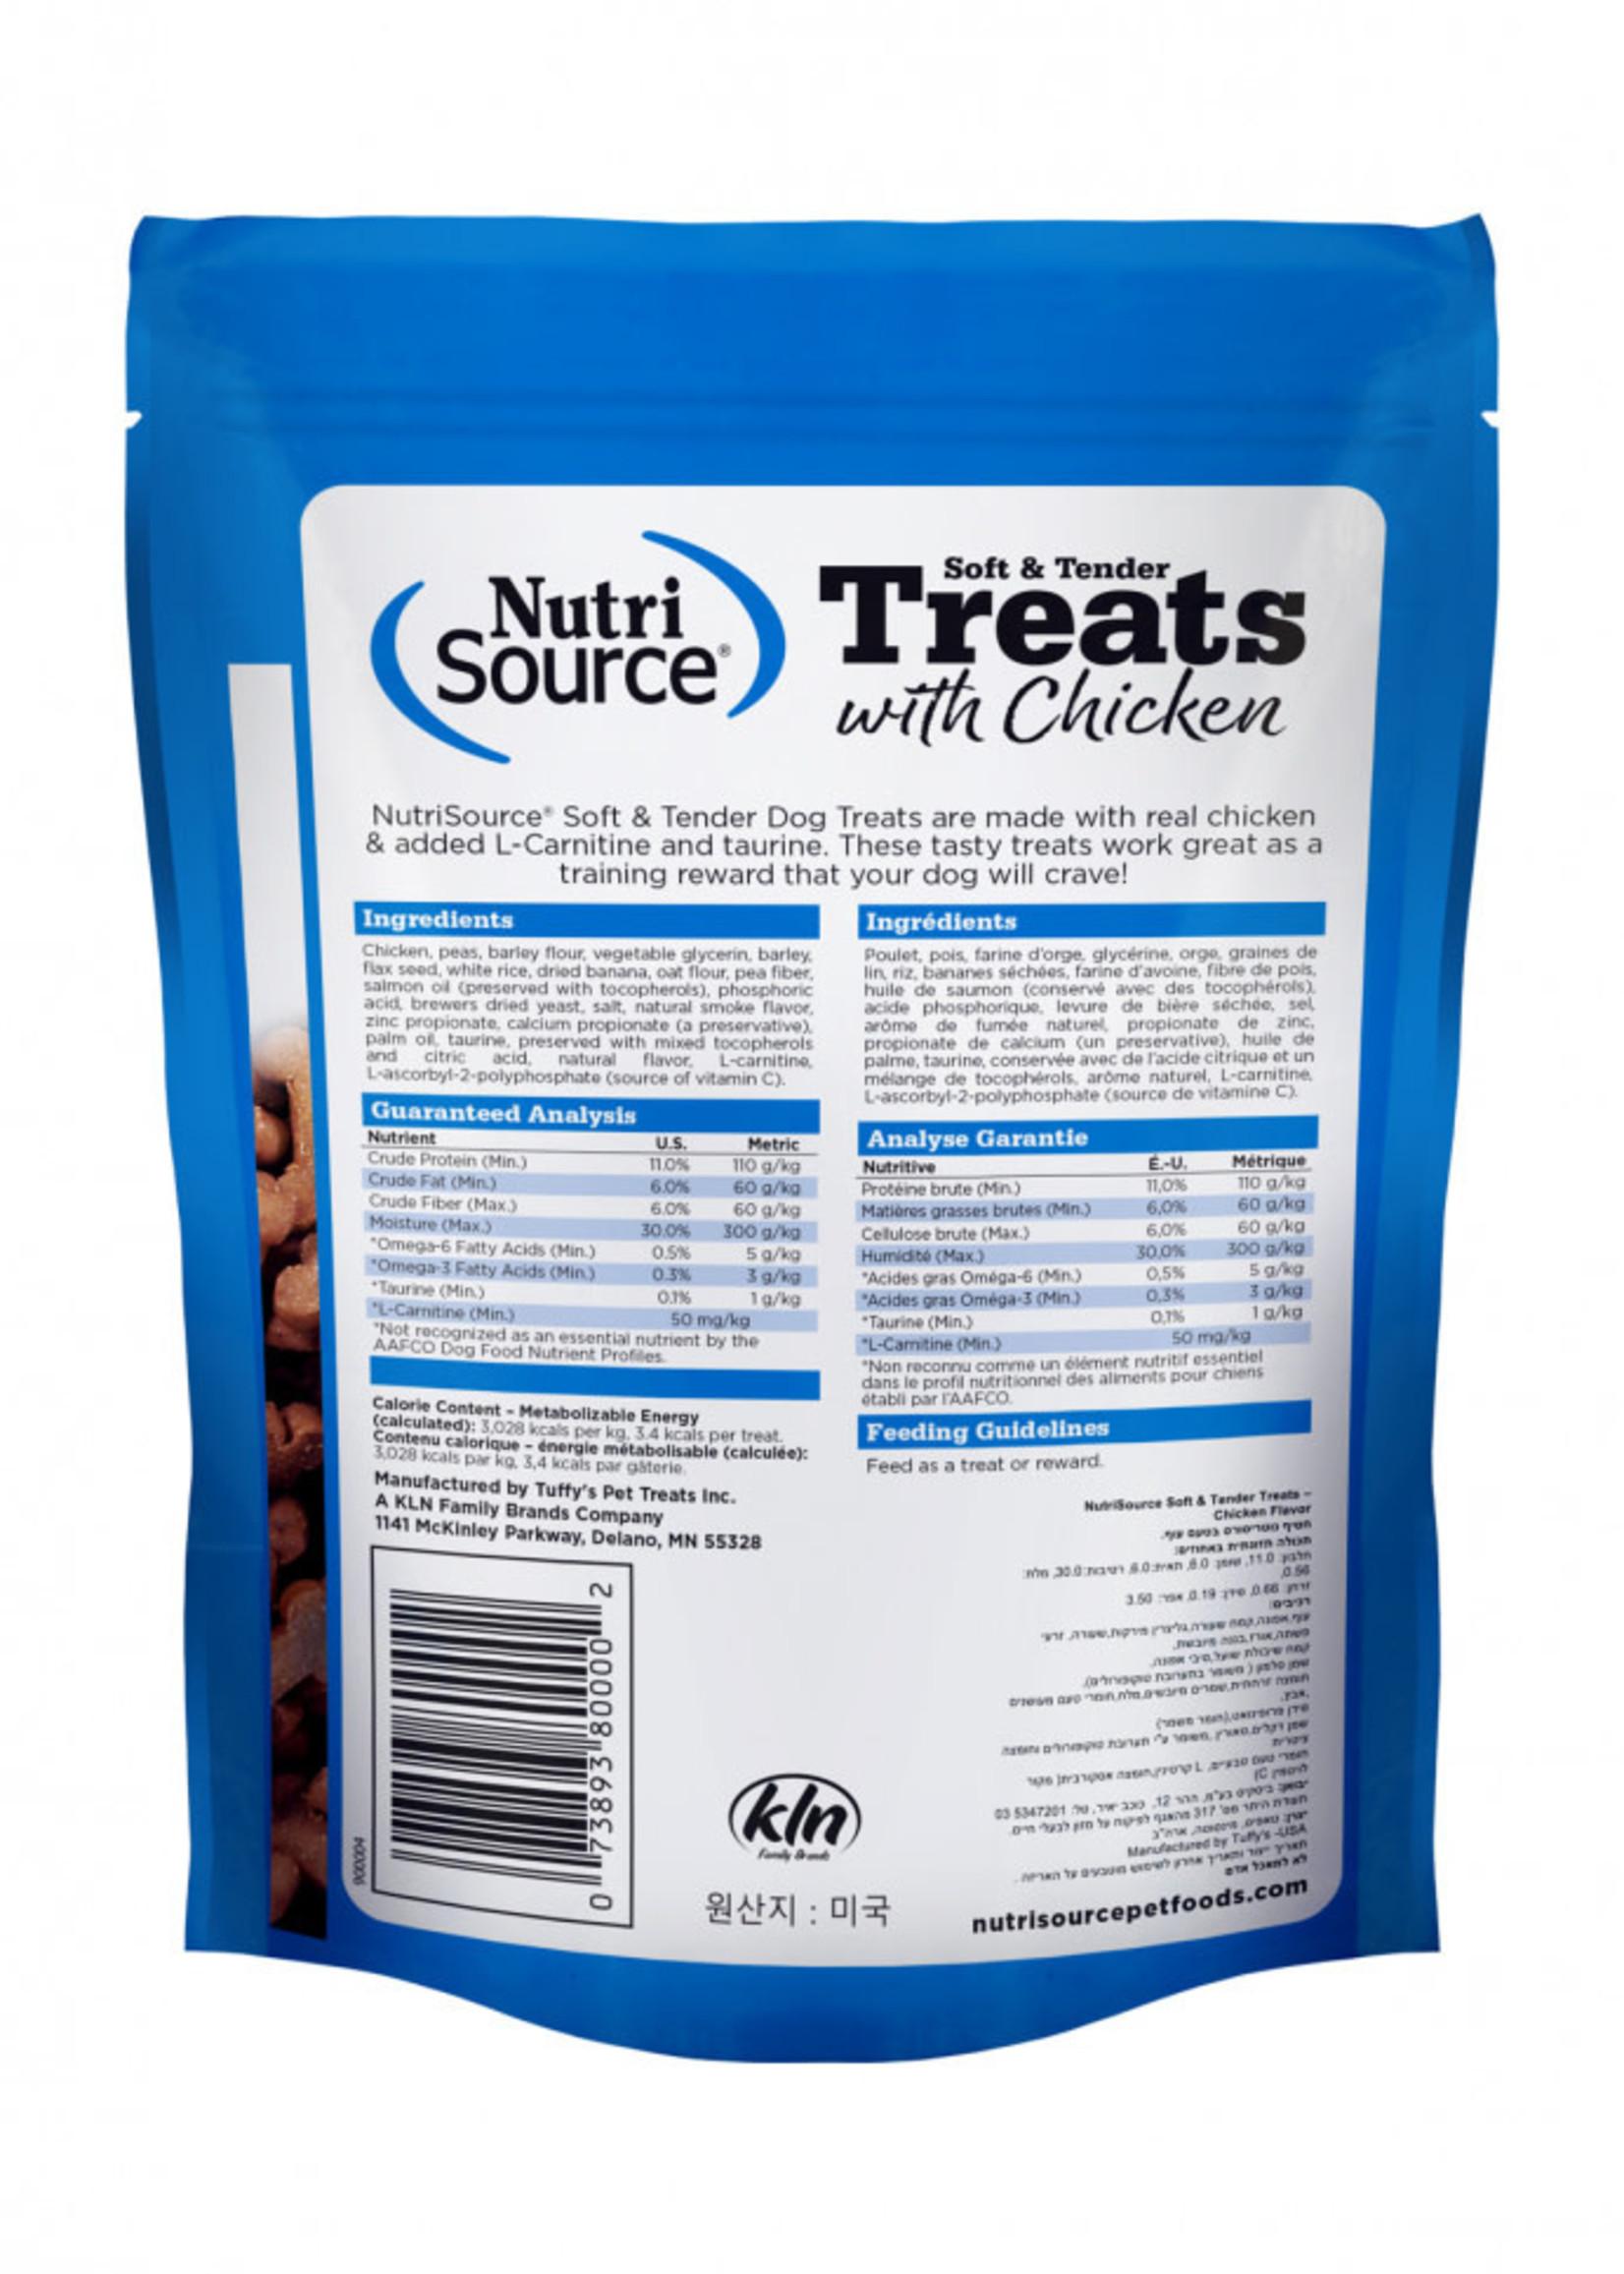 Nutrisource NutriSource Soft & Tender Chicken Treats 6 oz